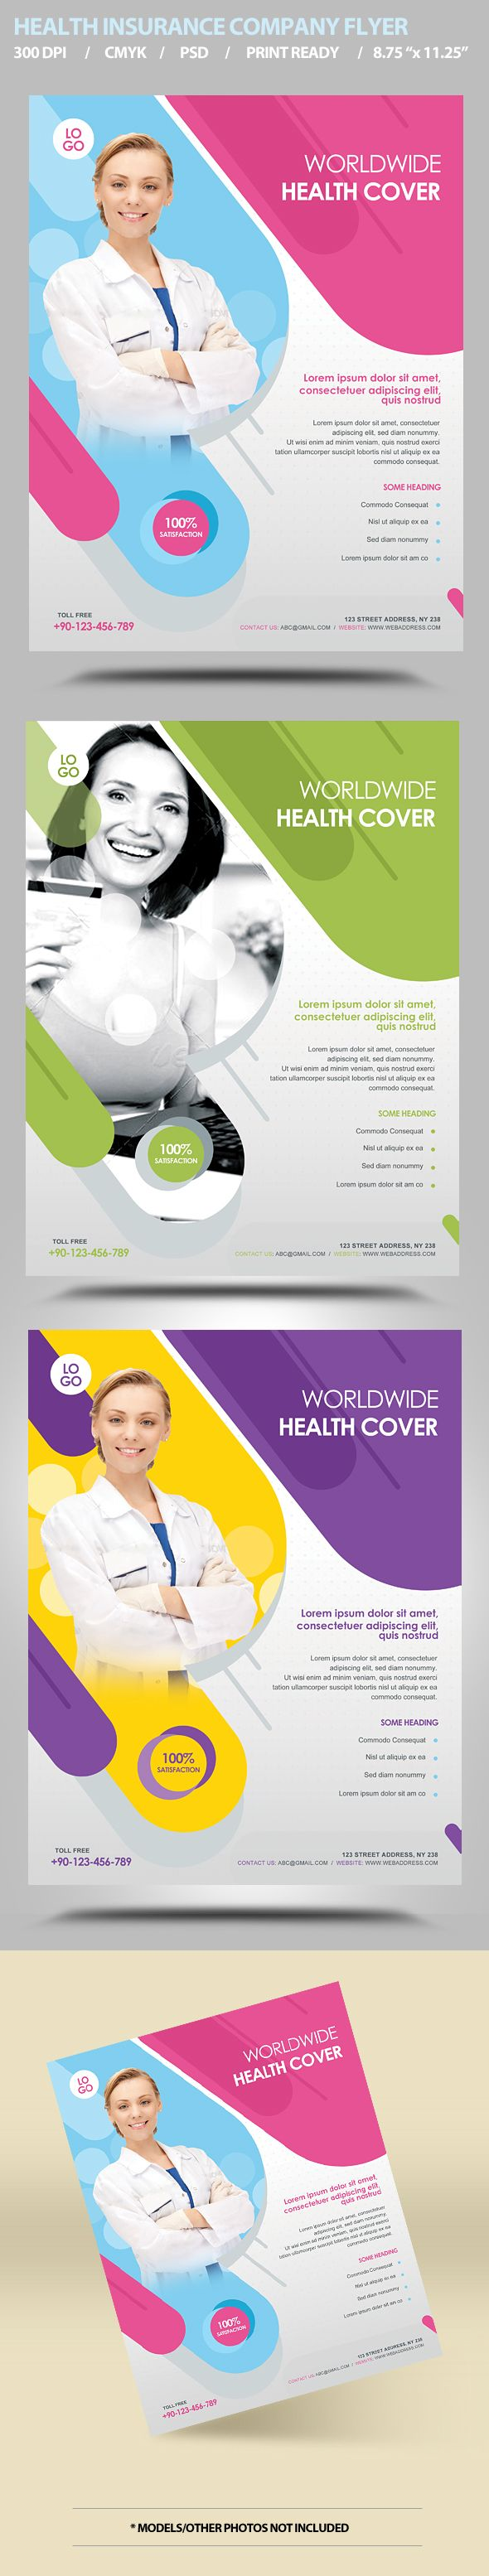 Health Insurance Flyer Template by satgur , via Behance